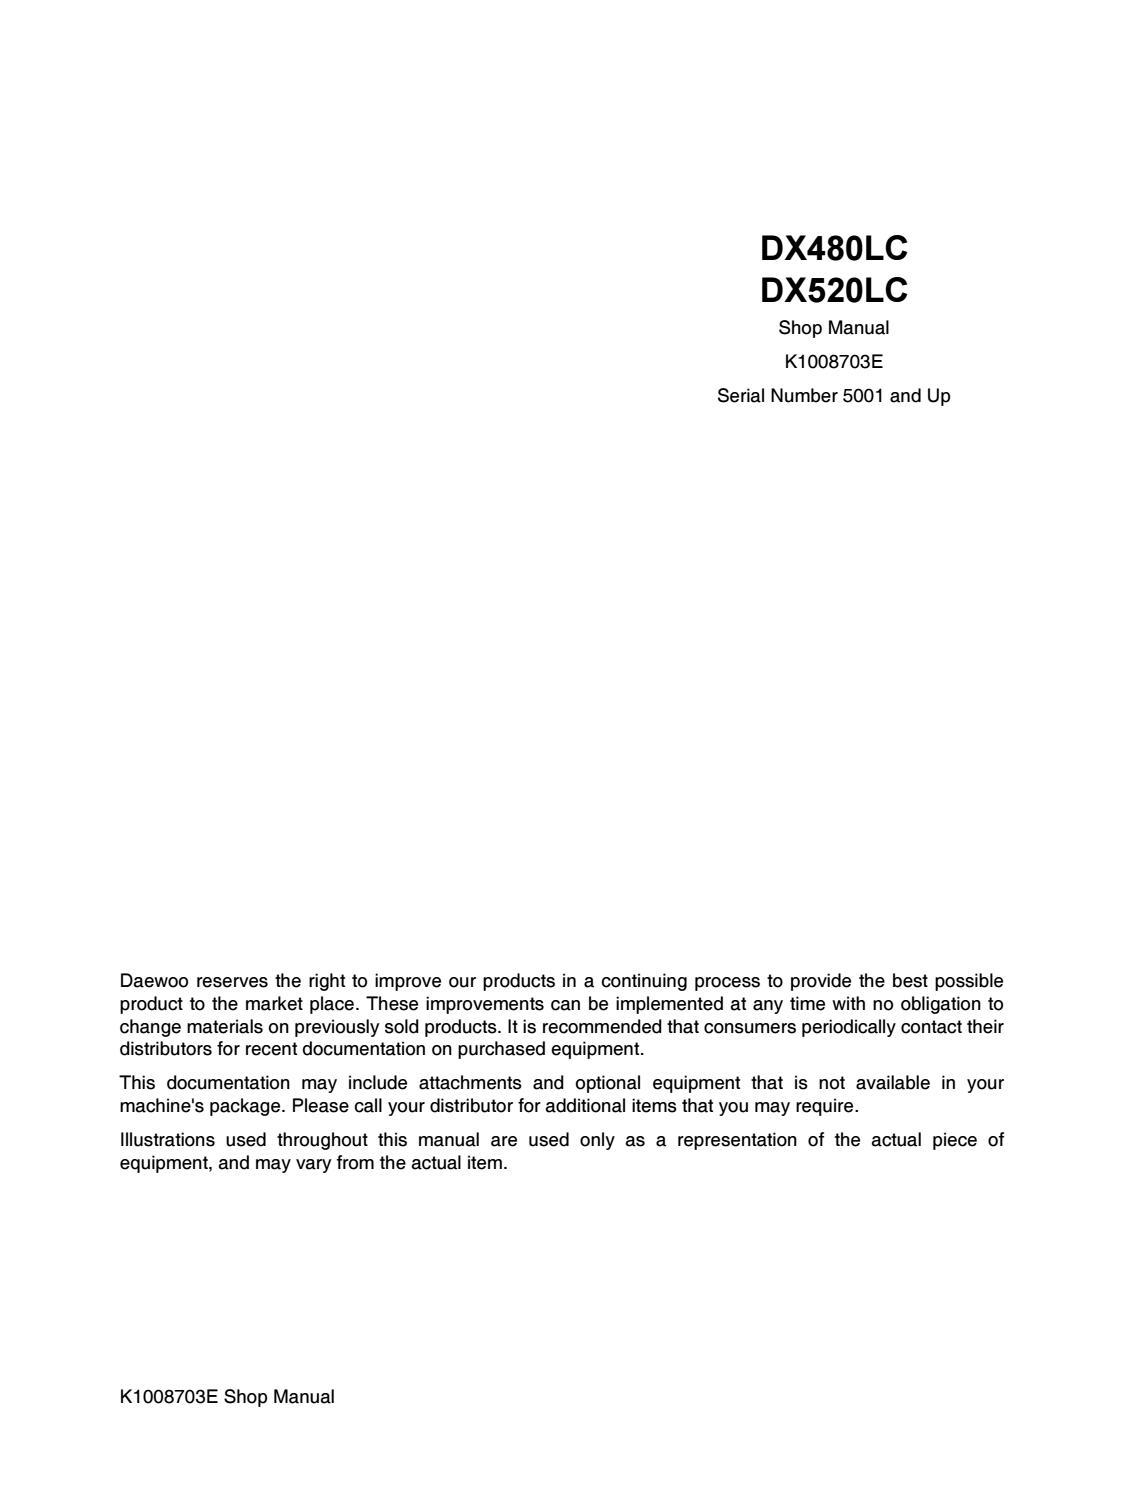 DAEWOO DOOSAN DX480LC EXCAVATOR Service Repair Manual by